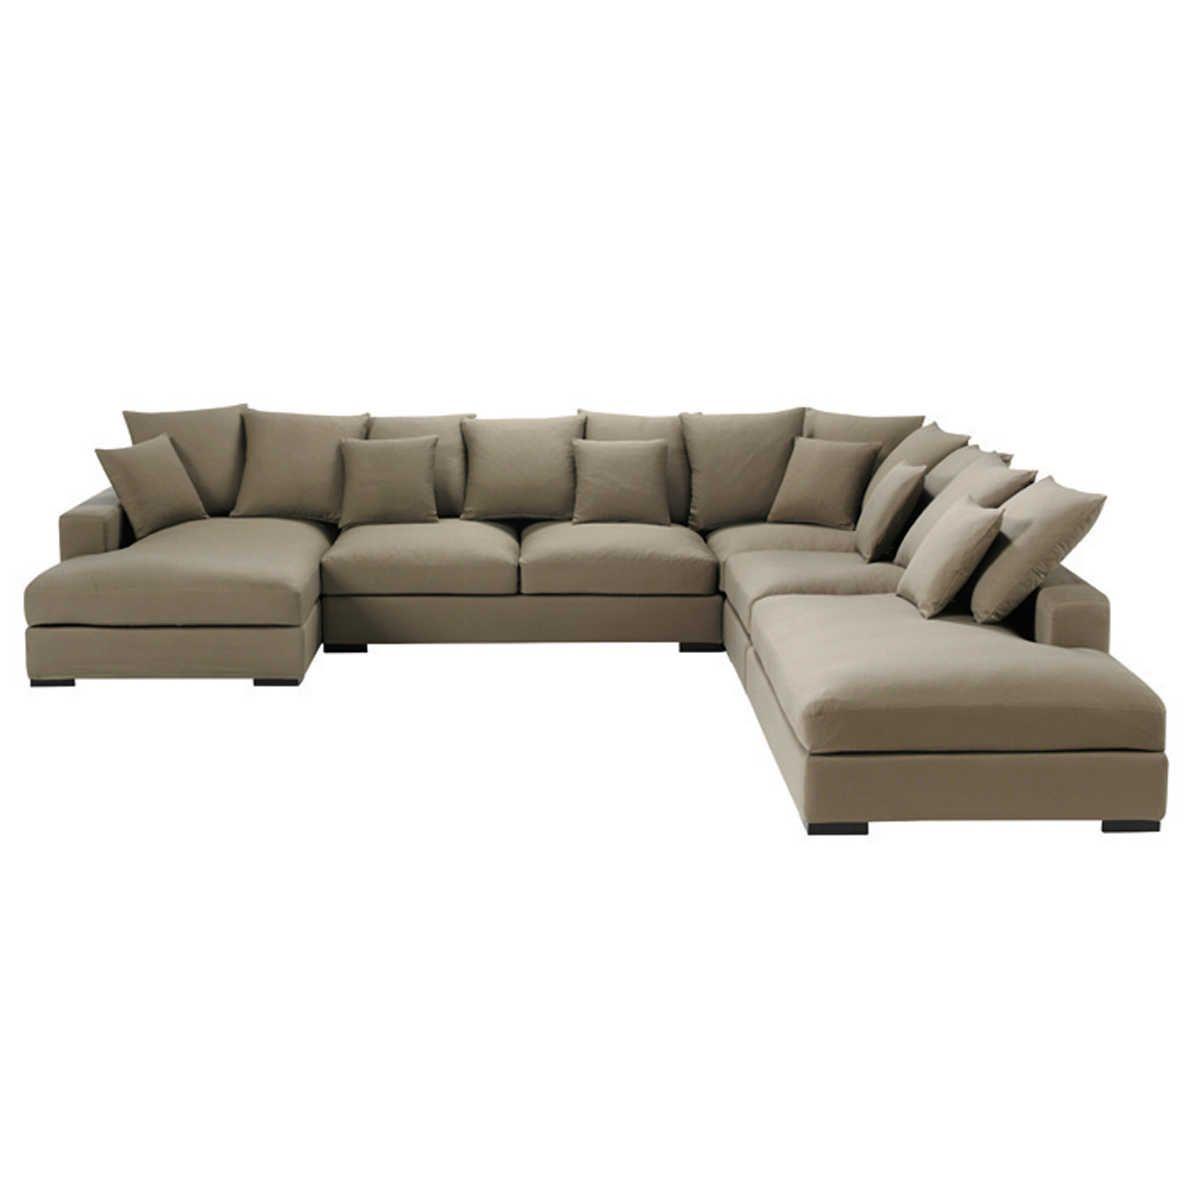 canap d 39 angle modulable 7 places en coton ivoire taupe. Black Bedroom Furniture Sets. Home Design Ideas